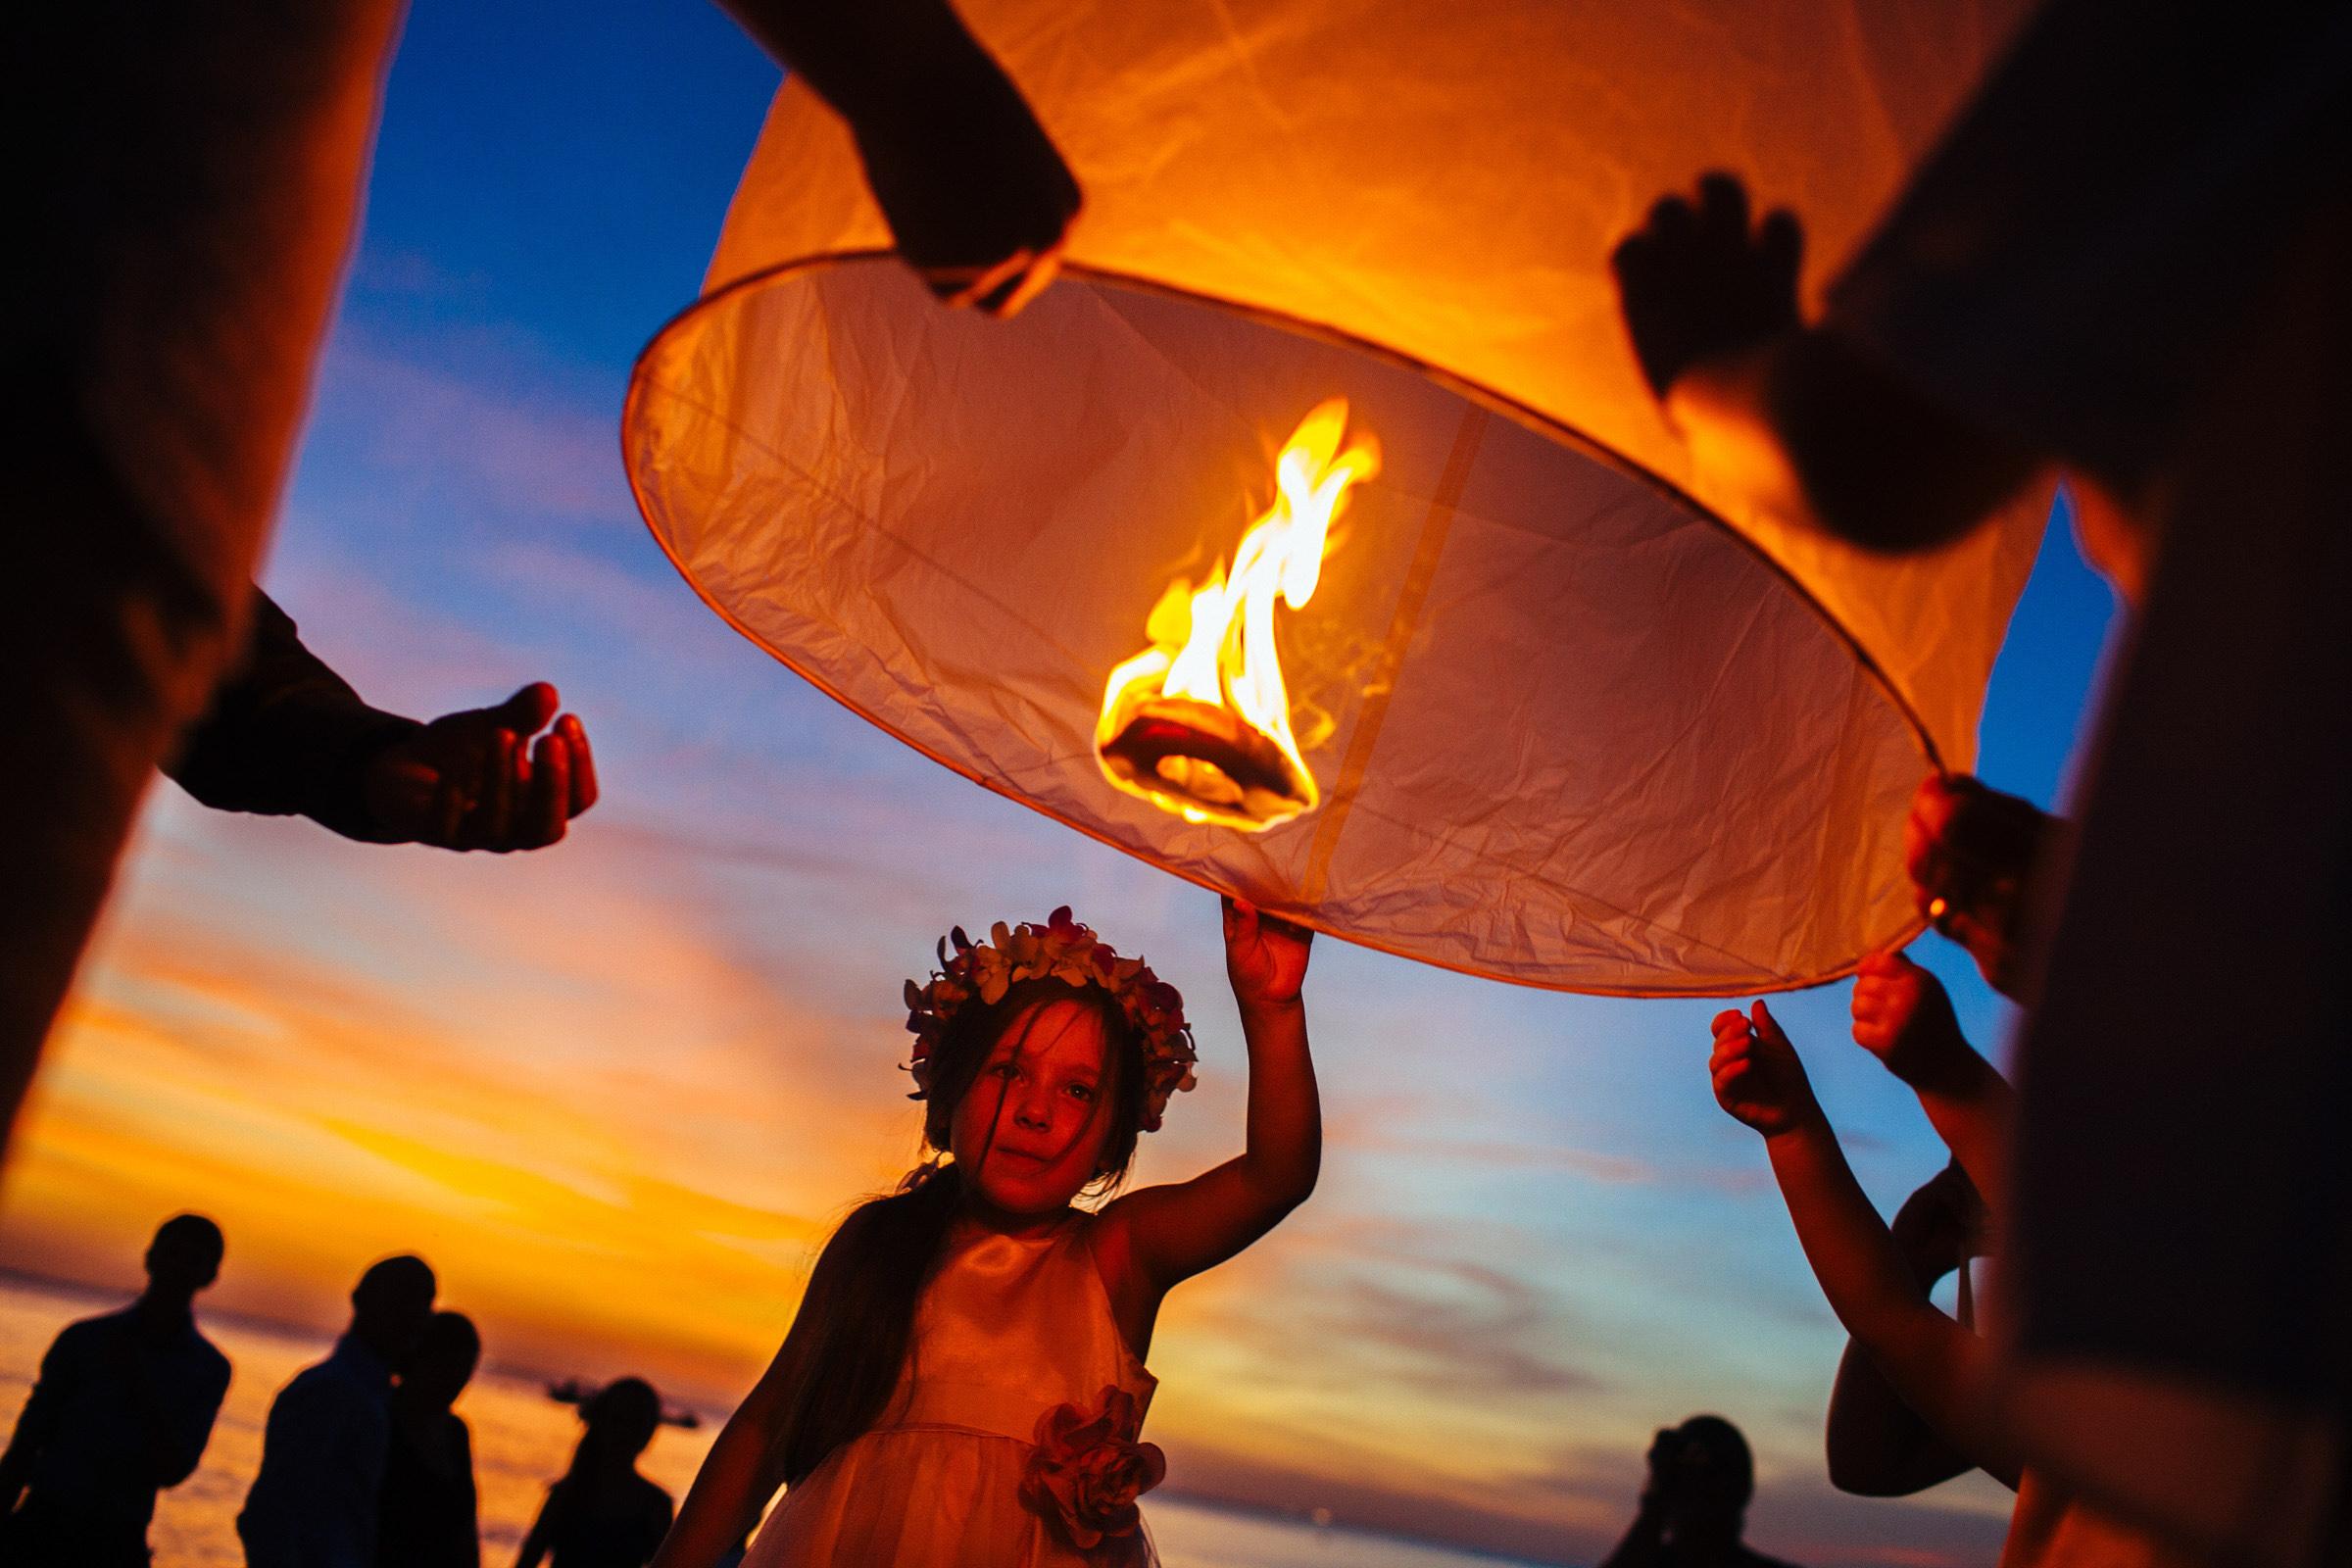 Flower girl against lantern - Photo by Wainwright Weddings